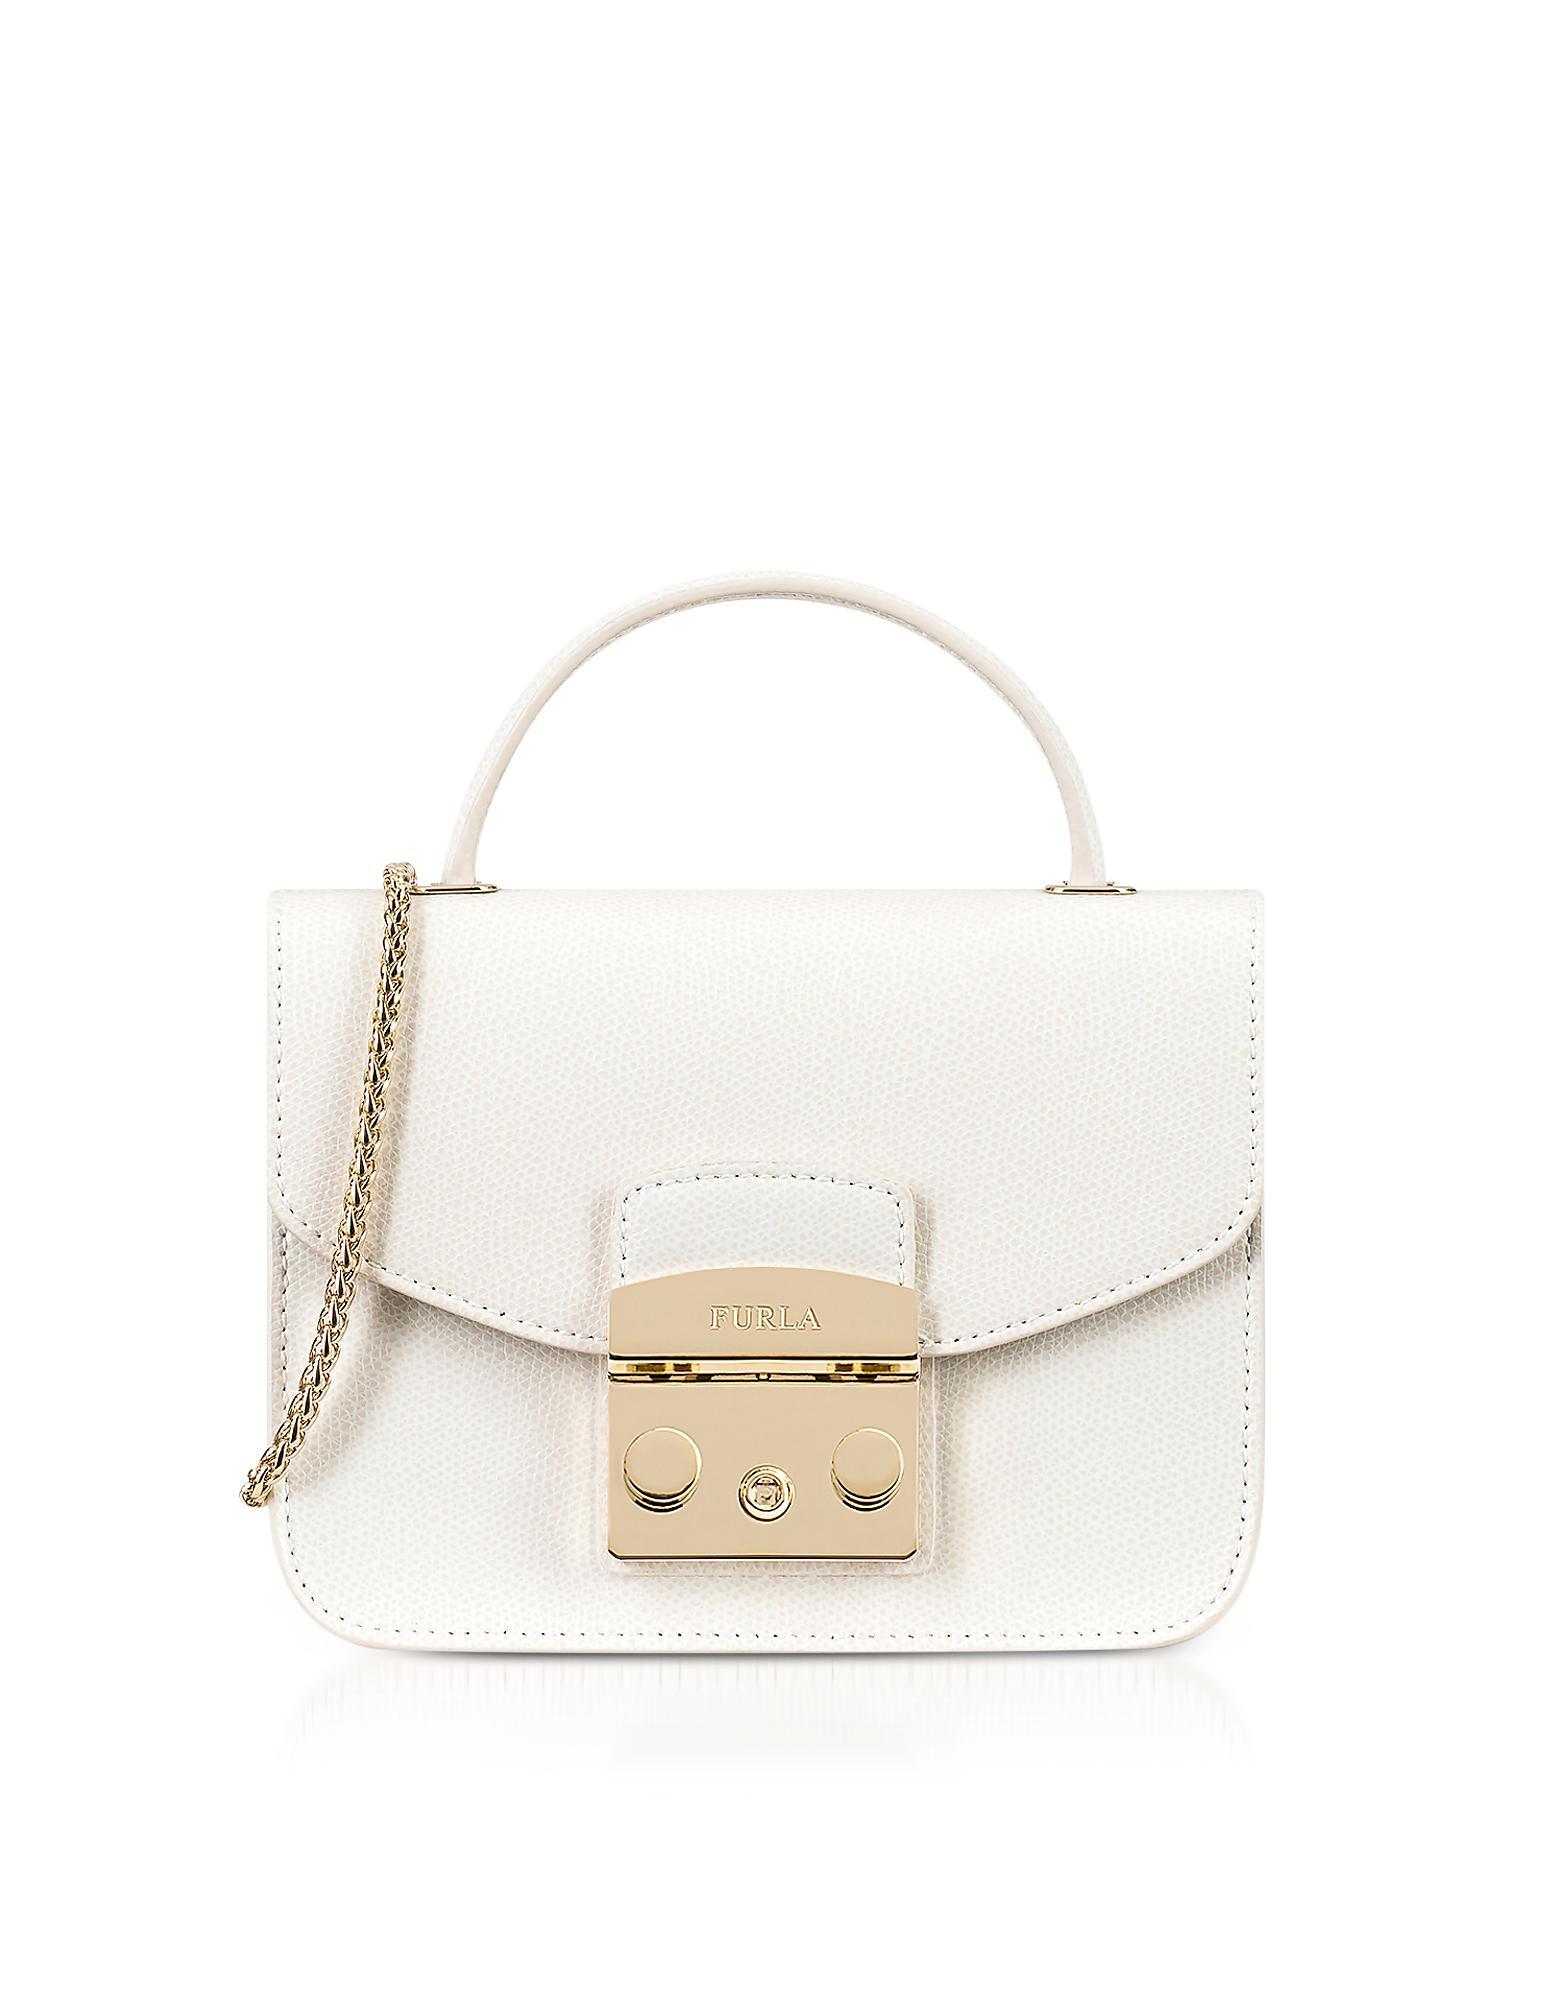 beb2a03b6 Furla Petalo Metropolis Mini Top Handle Crossbody Bag in White - Lyst